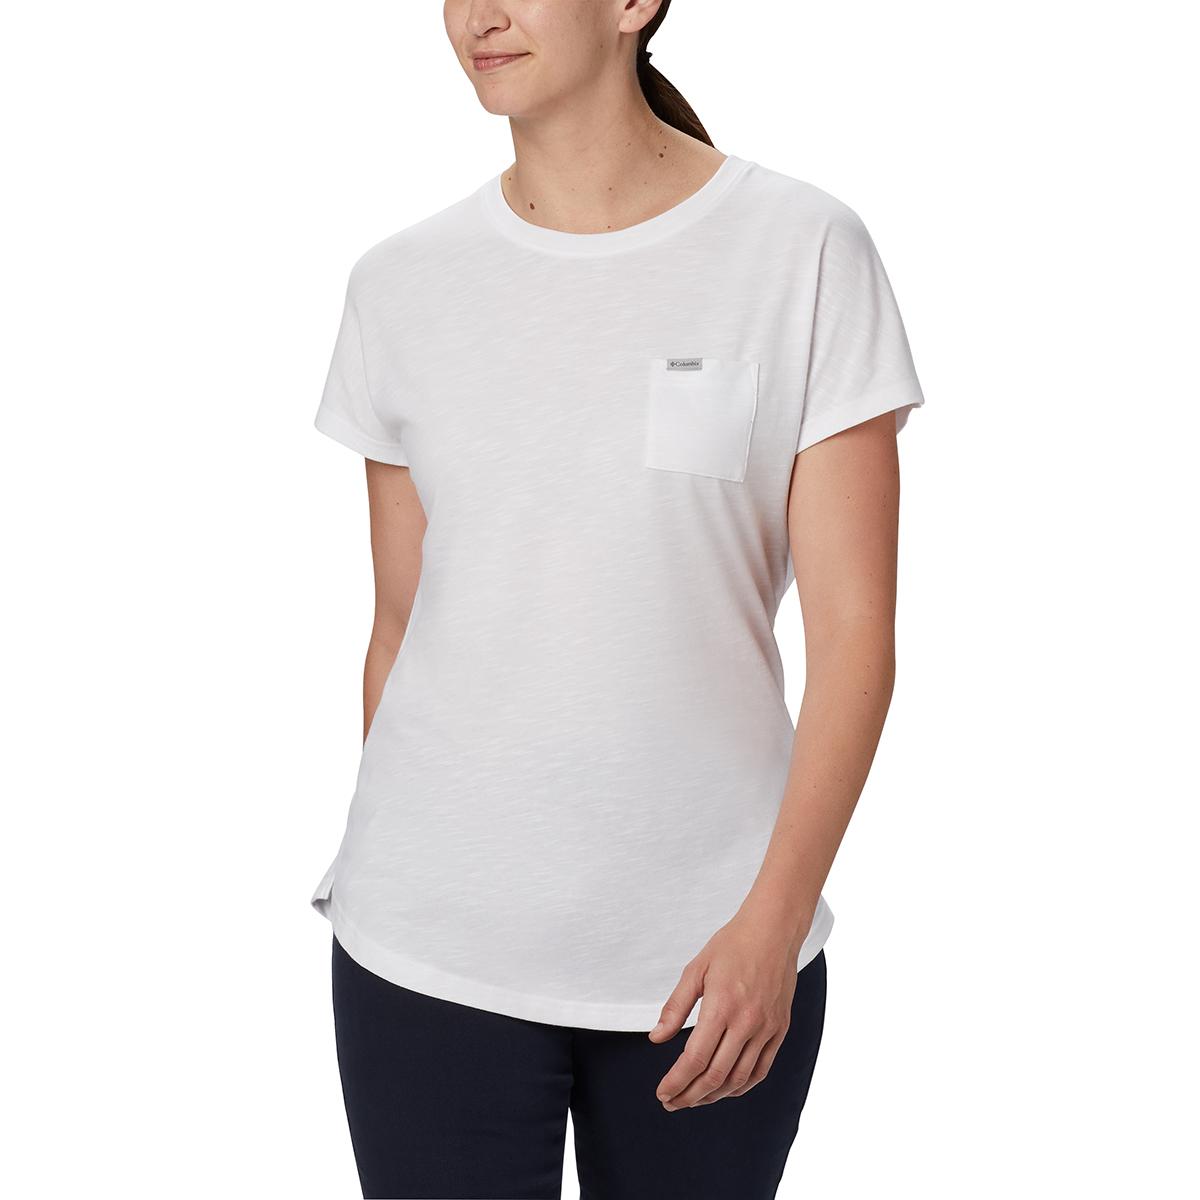 Columbia Women's Cades Cape Short-Sleeve Tee - White, XL